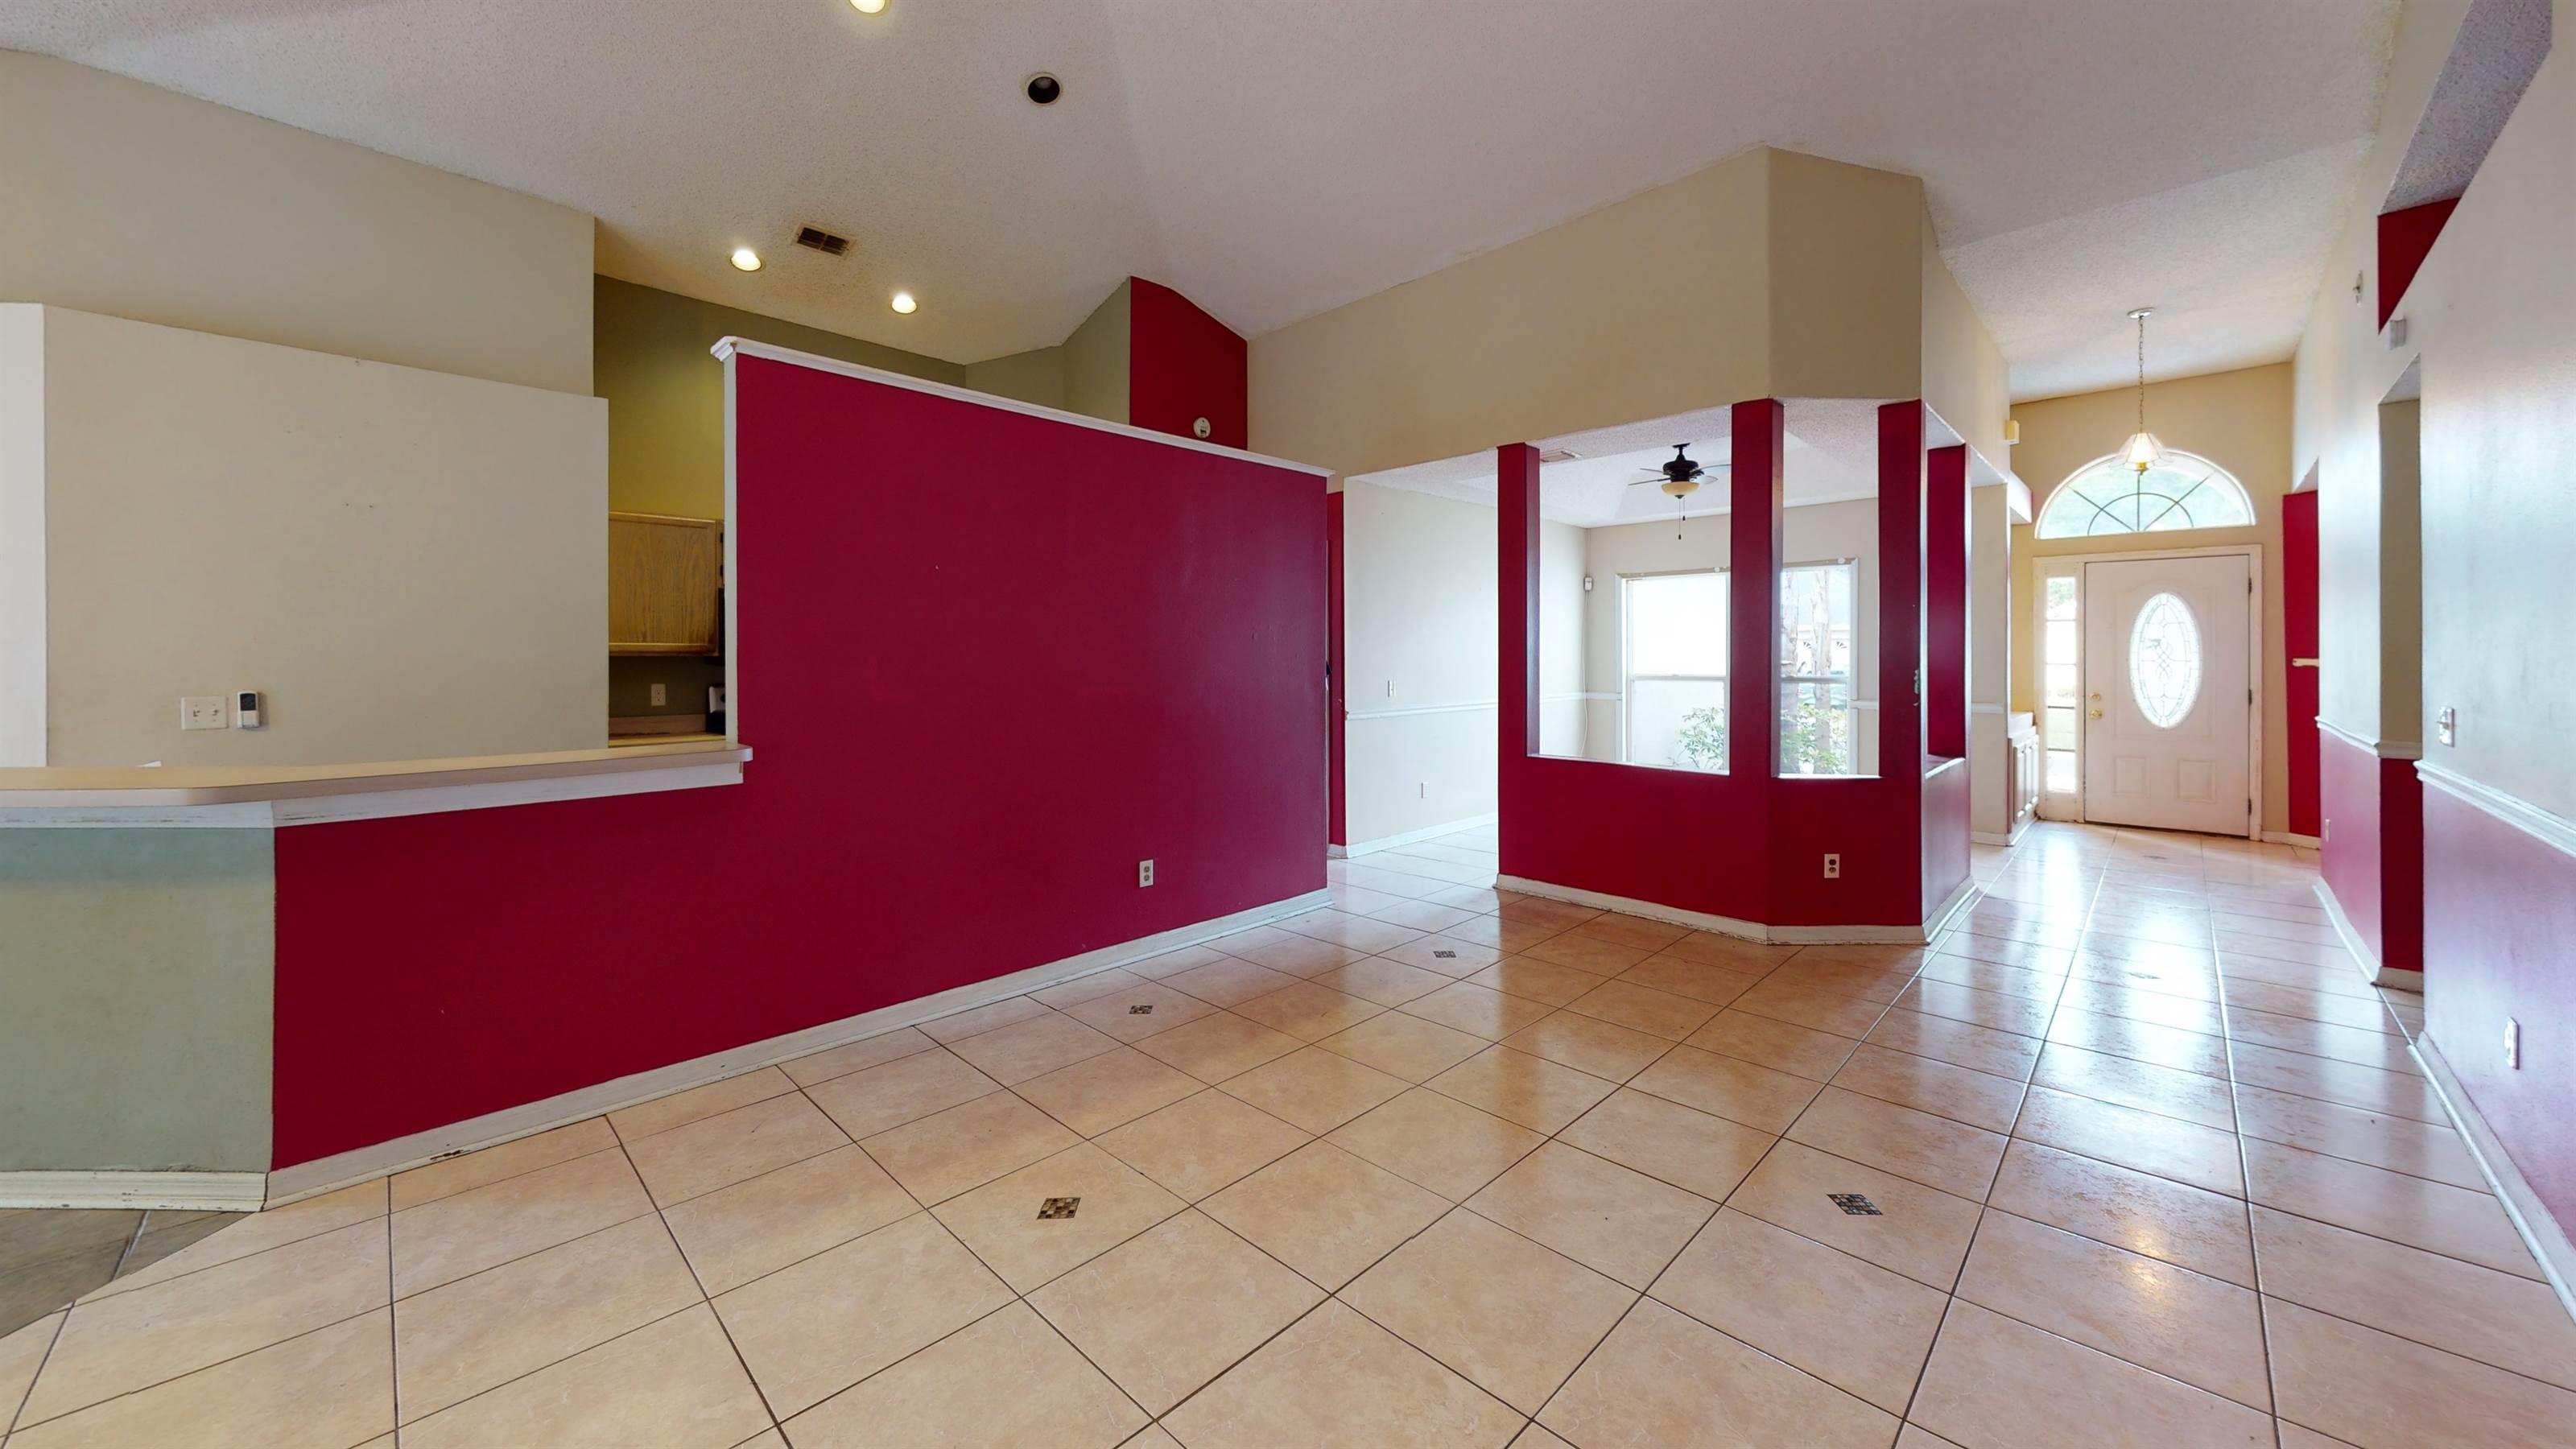 1039 Sweetbrook Way, ORLANDO, Florida 32828, 4 Bedrooms Bedrooms, ,2 BathroomsBathrooms,Single Family,For Sale,1039 Sweetbrook Way,U8118942